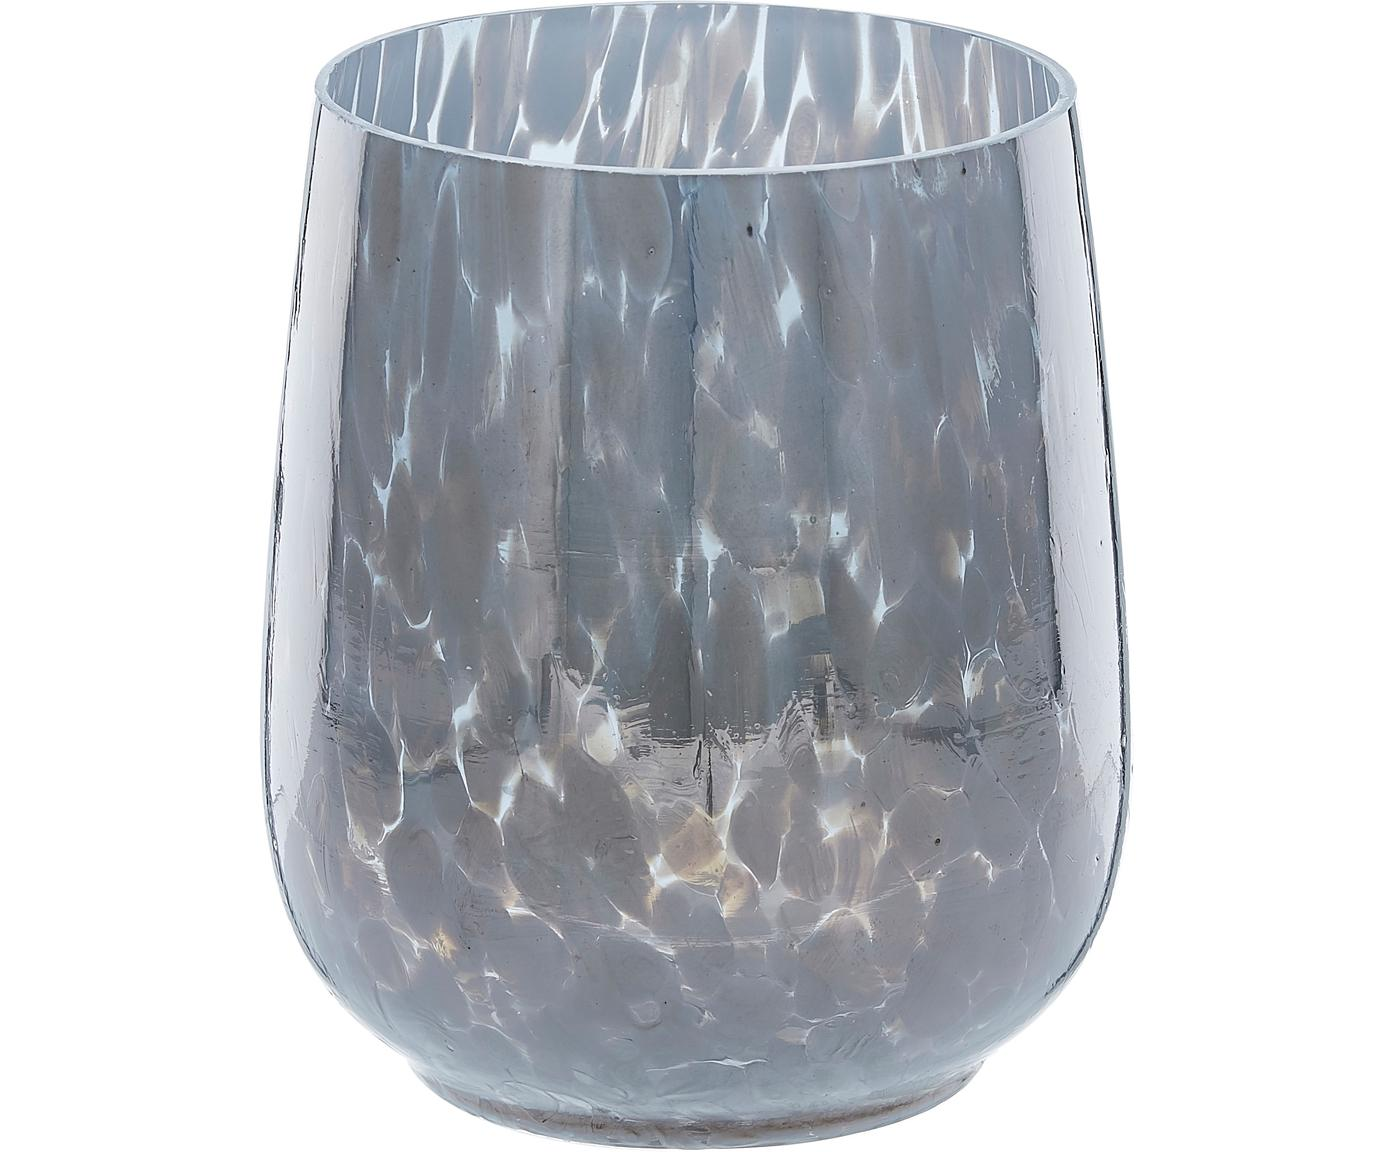 Teelichthalter Gunia, Glas, Blau, Ø 9 x H 12 cm